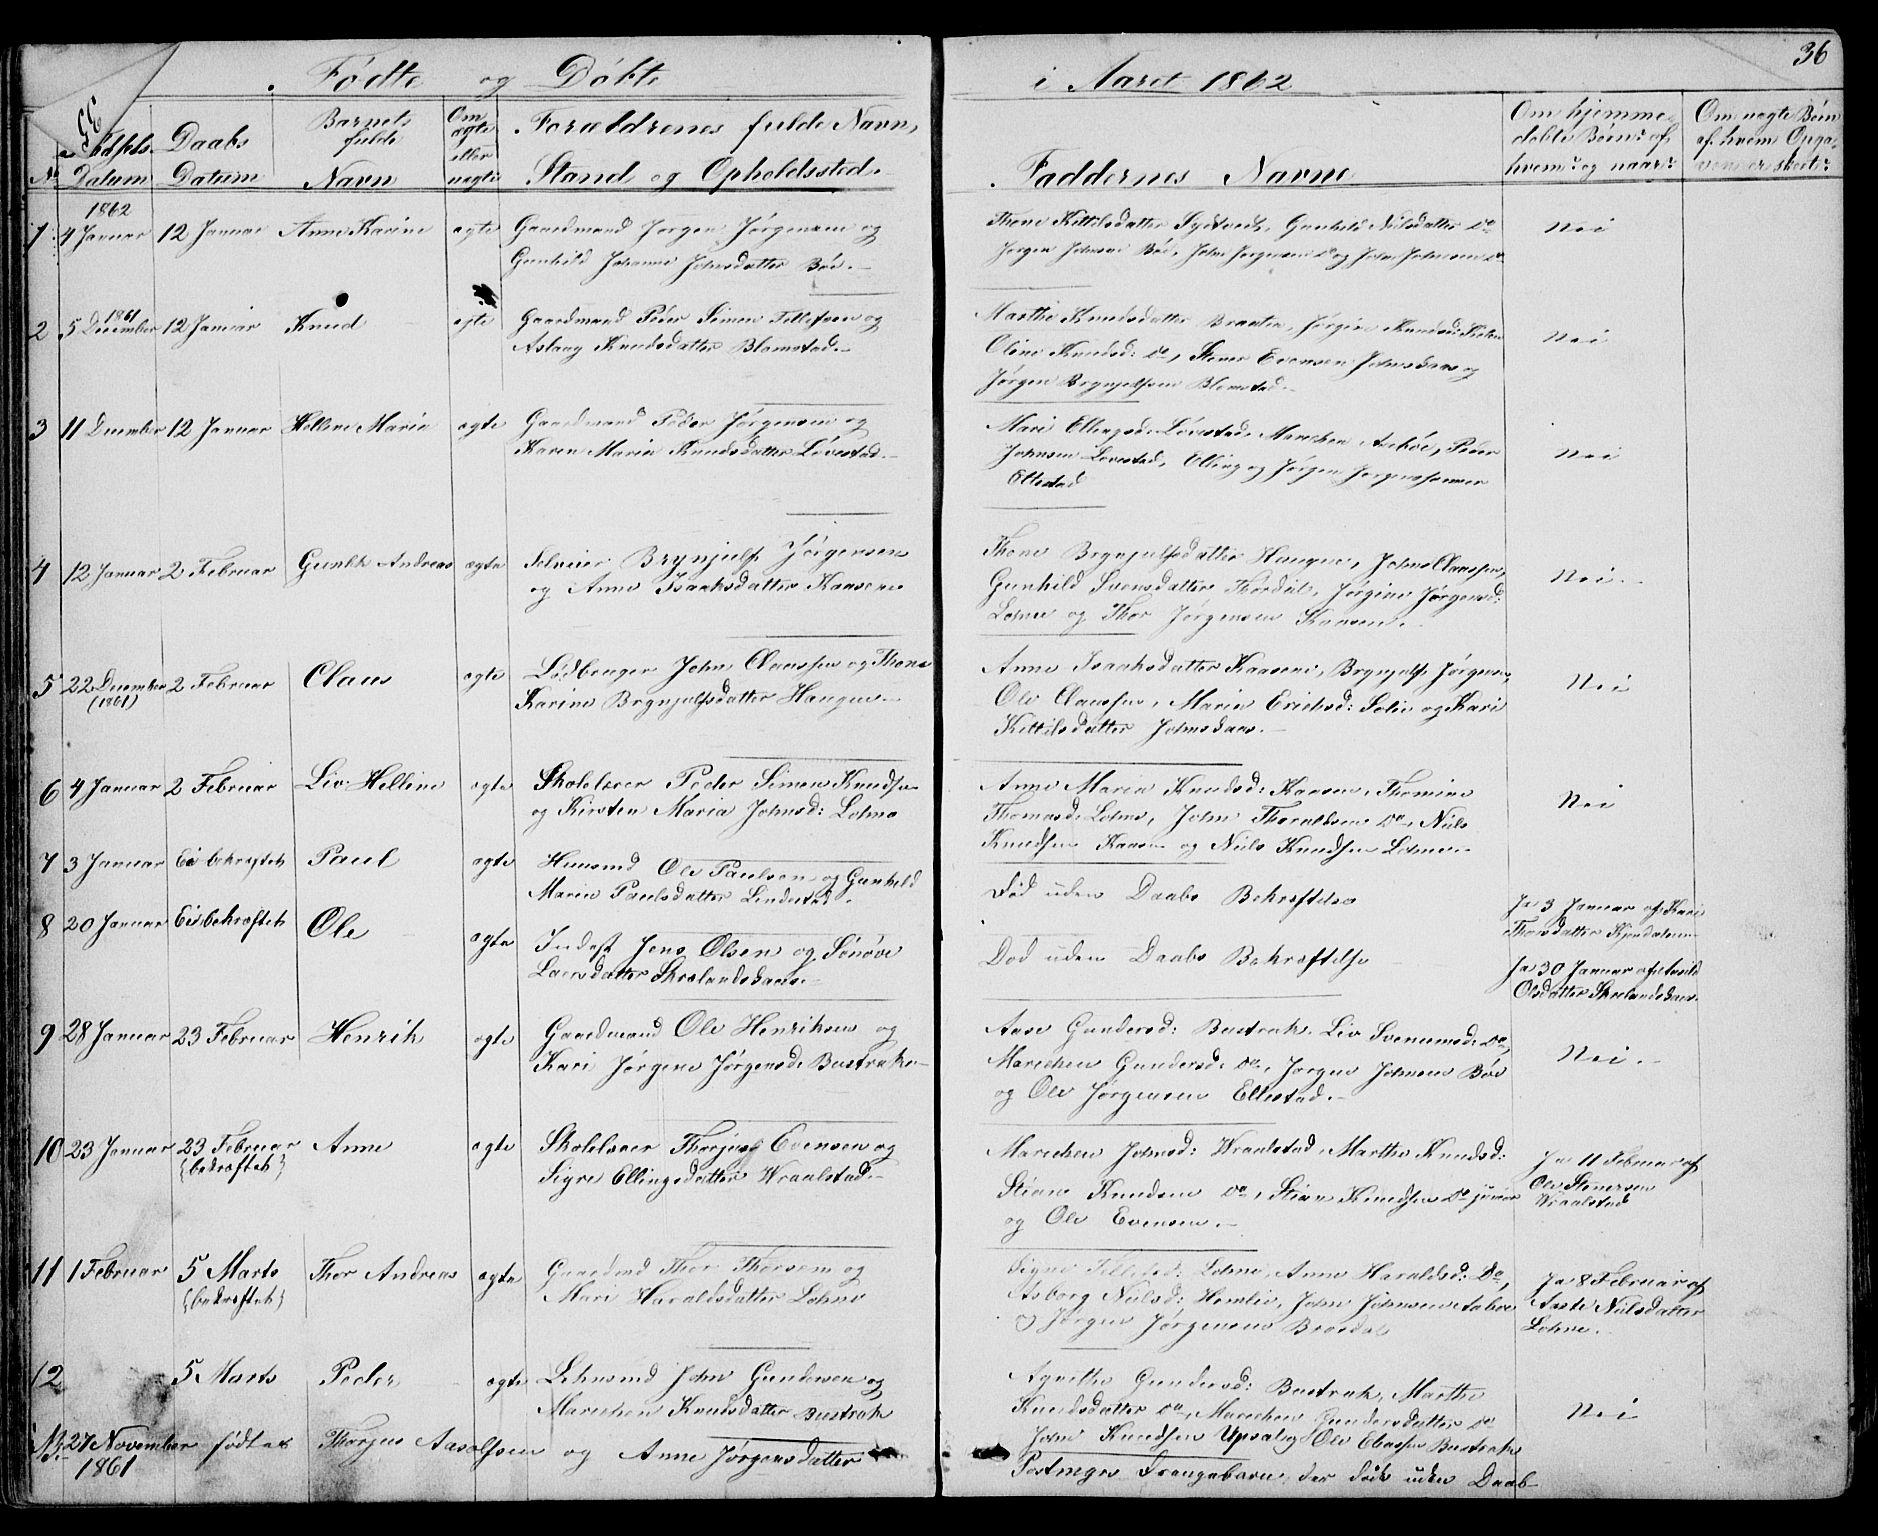 SAKO, Drangedal kirkebøker, G/Gb/L0001: Klokkerbok nr. II 1, 1856-1894, s. 36